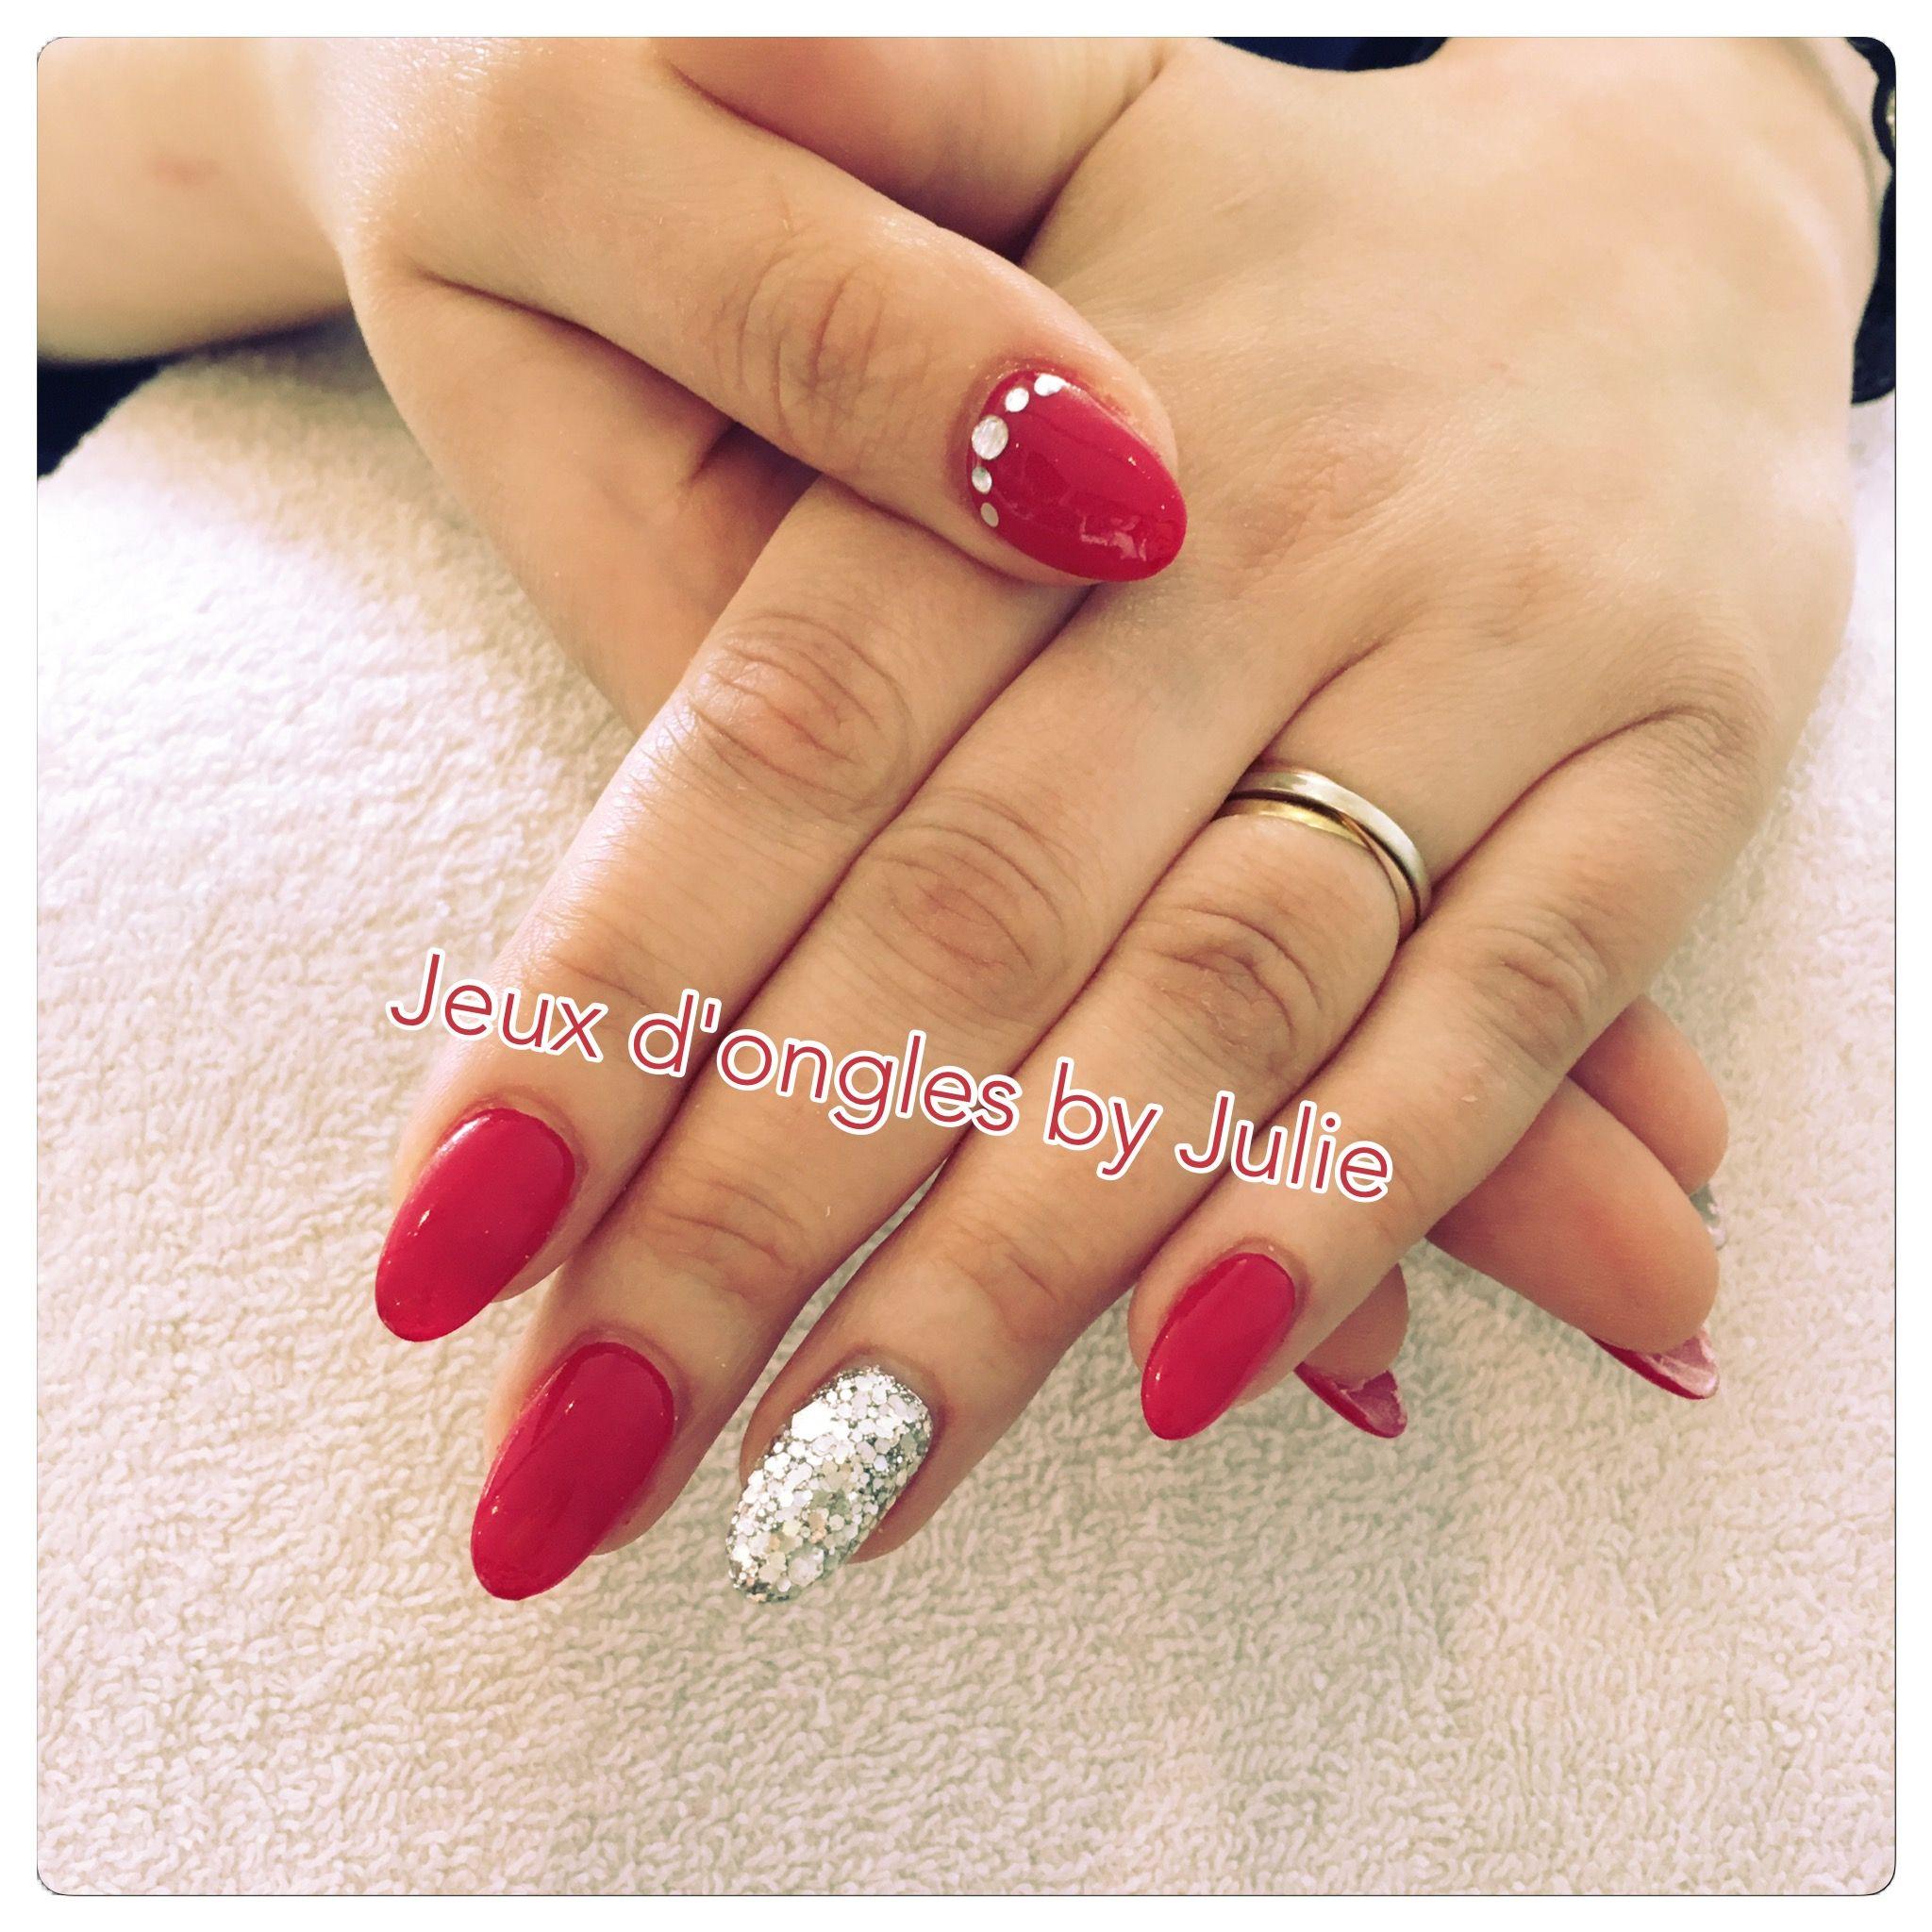 gel rouge glamour avec un ongle paillet argent et strass argent s ongles en 2018 pinterest. Black Bedroom Furniture Sets. Home Design Ideas